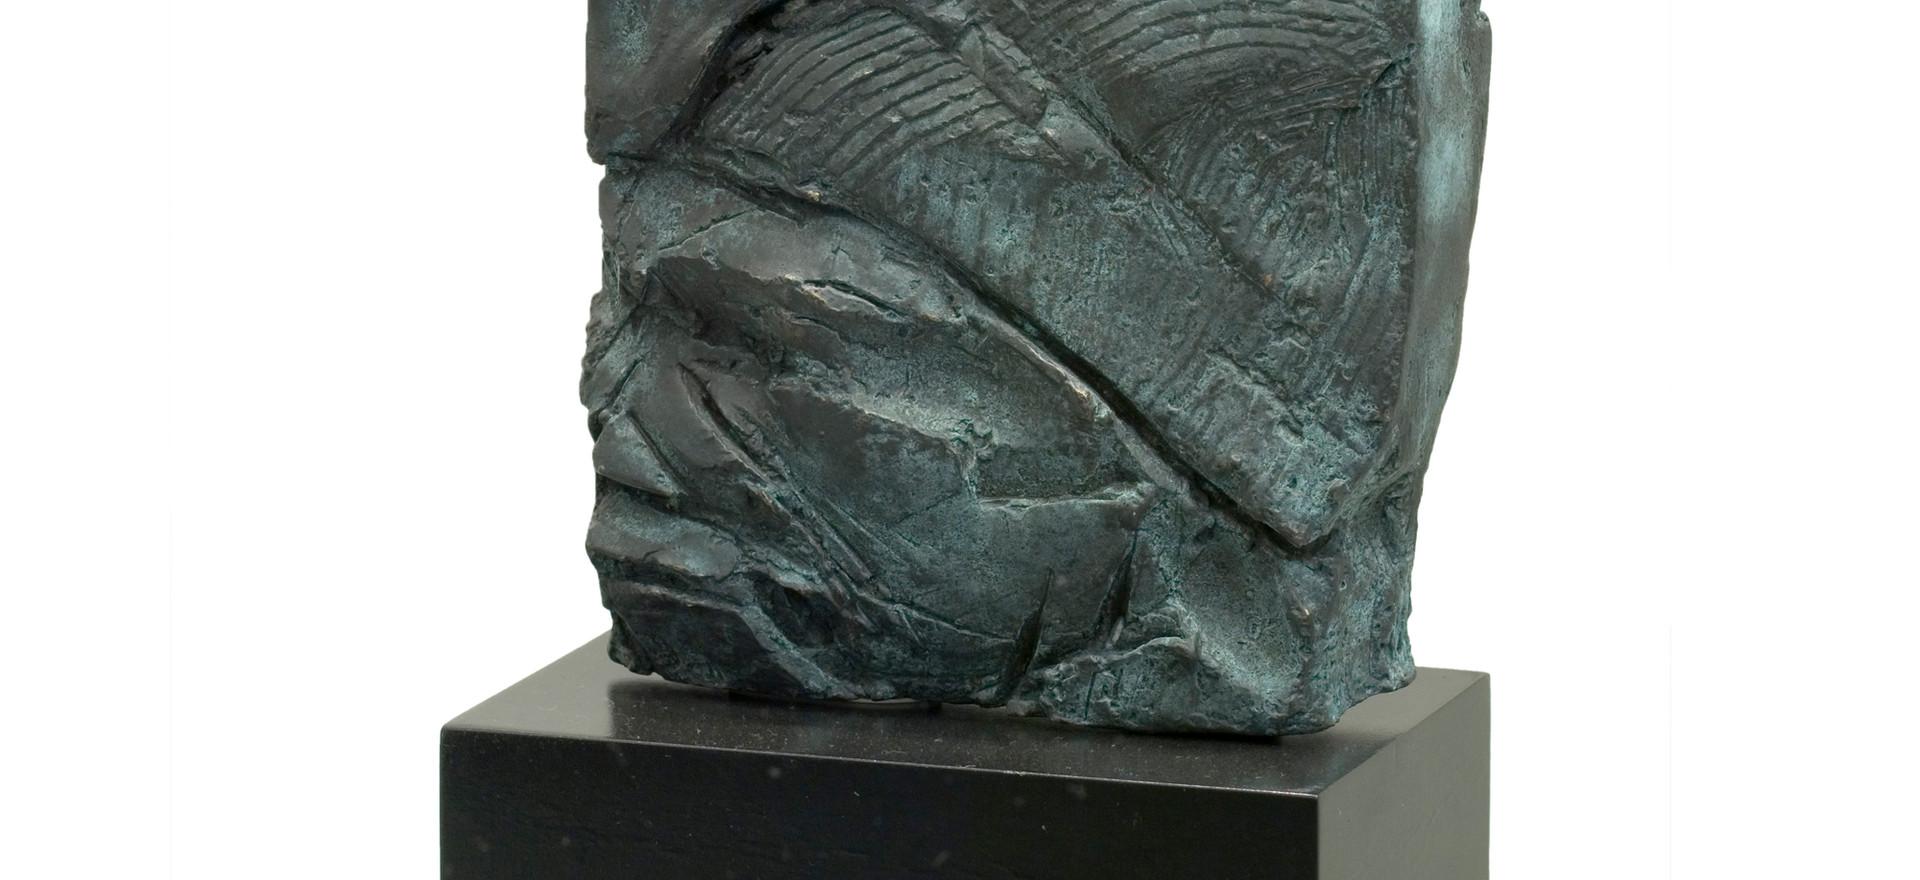 'Pyro I', 2004, bronze, 14 x 13 x 2.5 cm